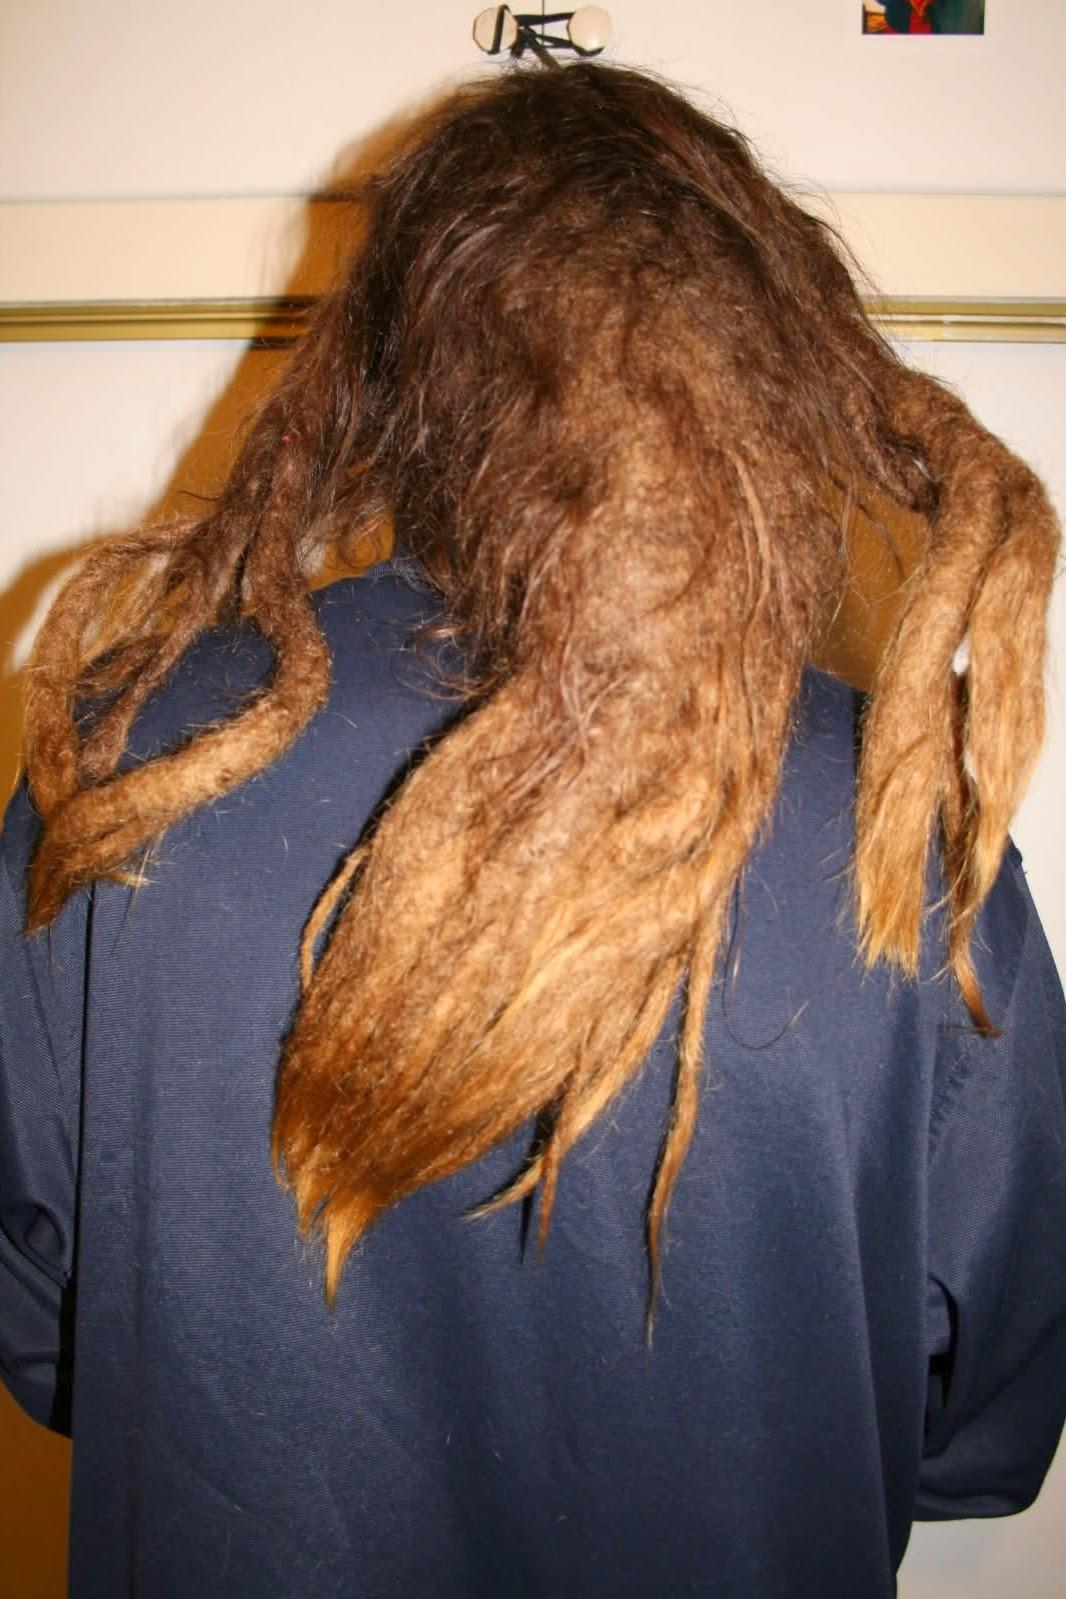 single bbw women in beaver island Xvideos interracial very large bbw woman free xvideoscom - the best free porn videos on internet, 100% free.